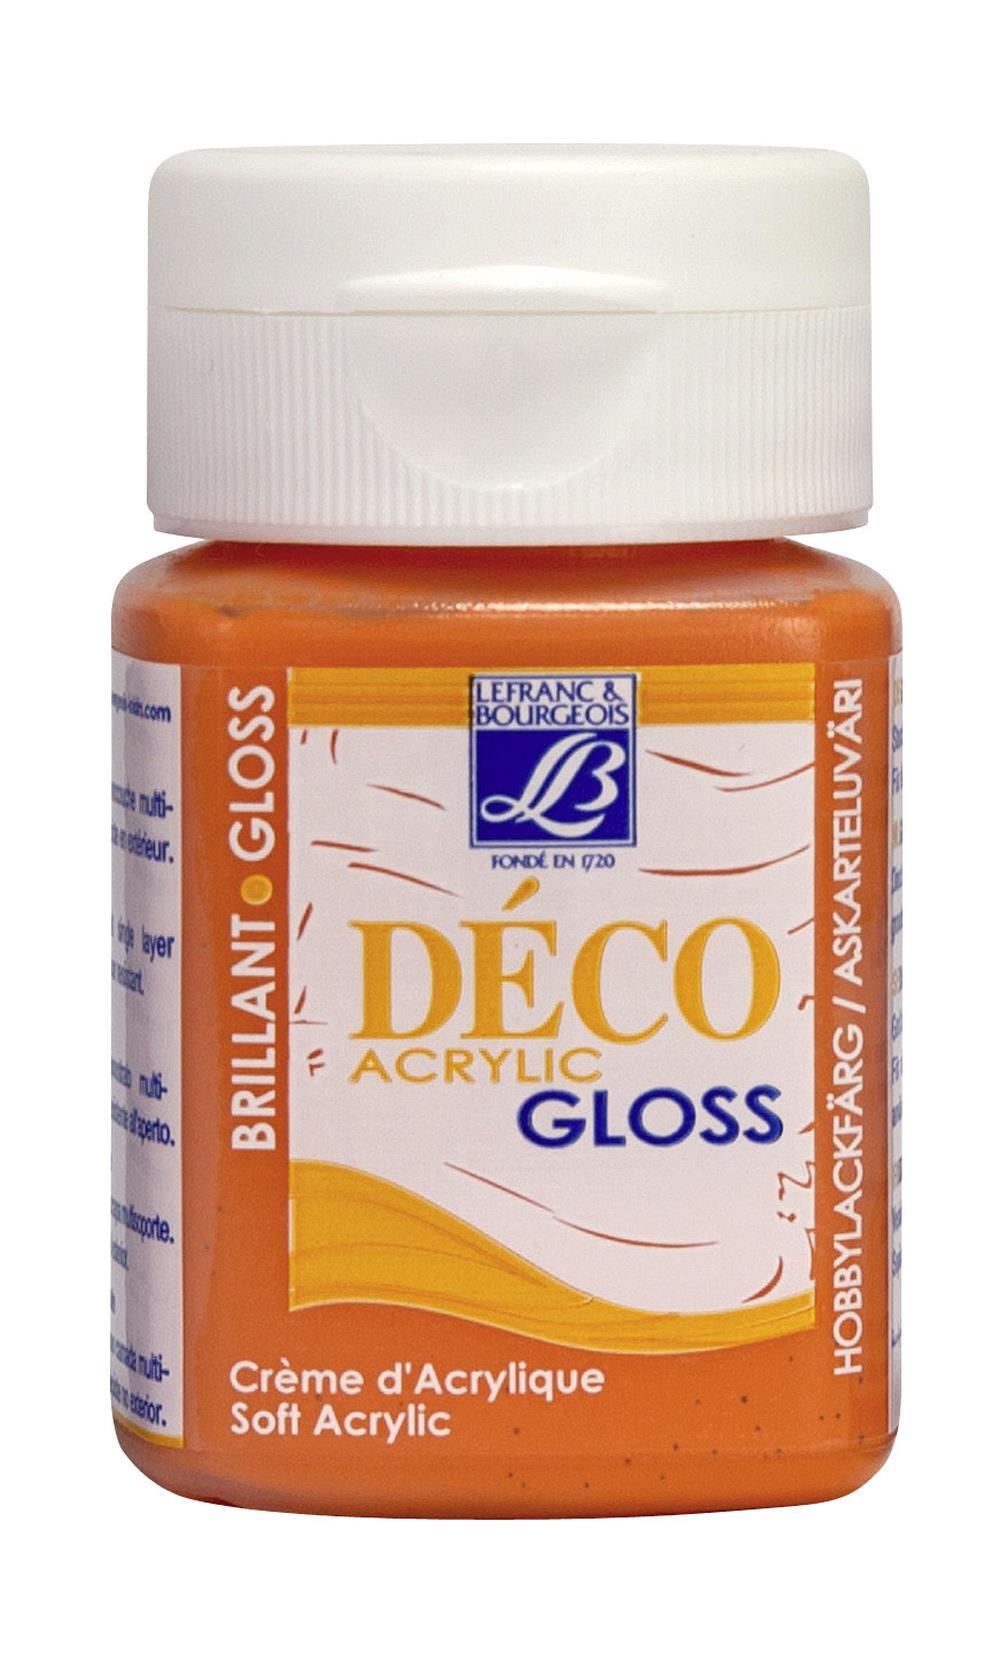 Hobbyfärg L&B Deco Gloss Akryl 50ml  Coral 332 (4F) Utgår